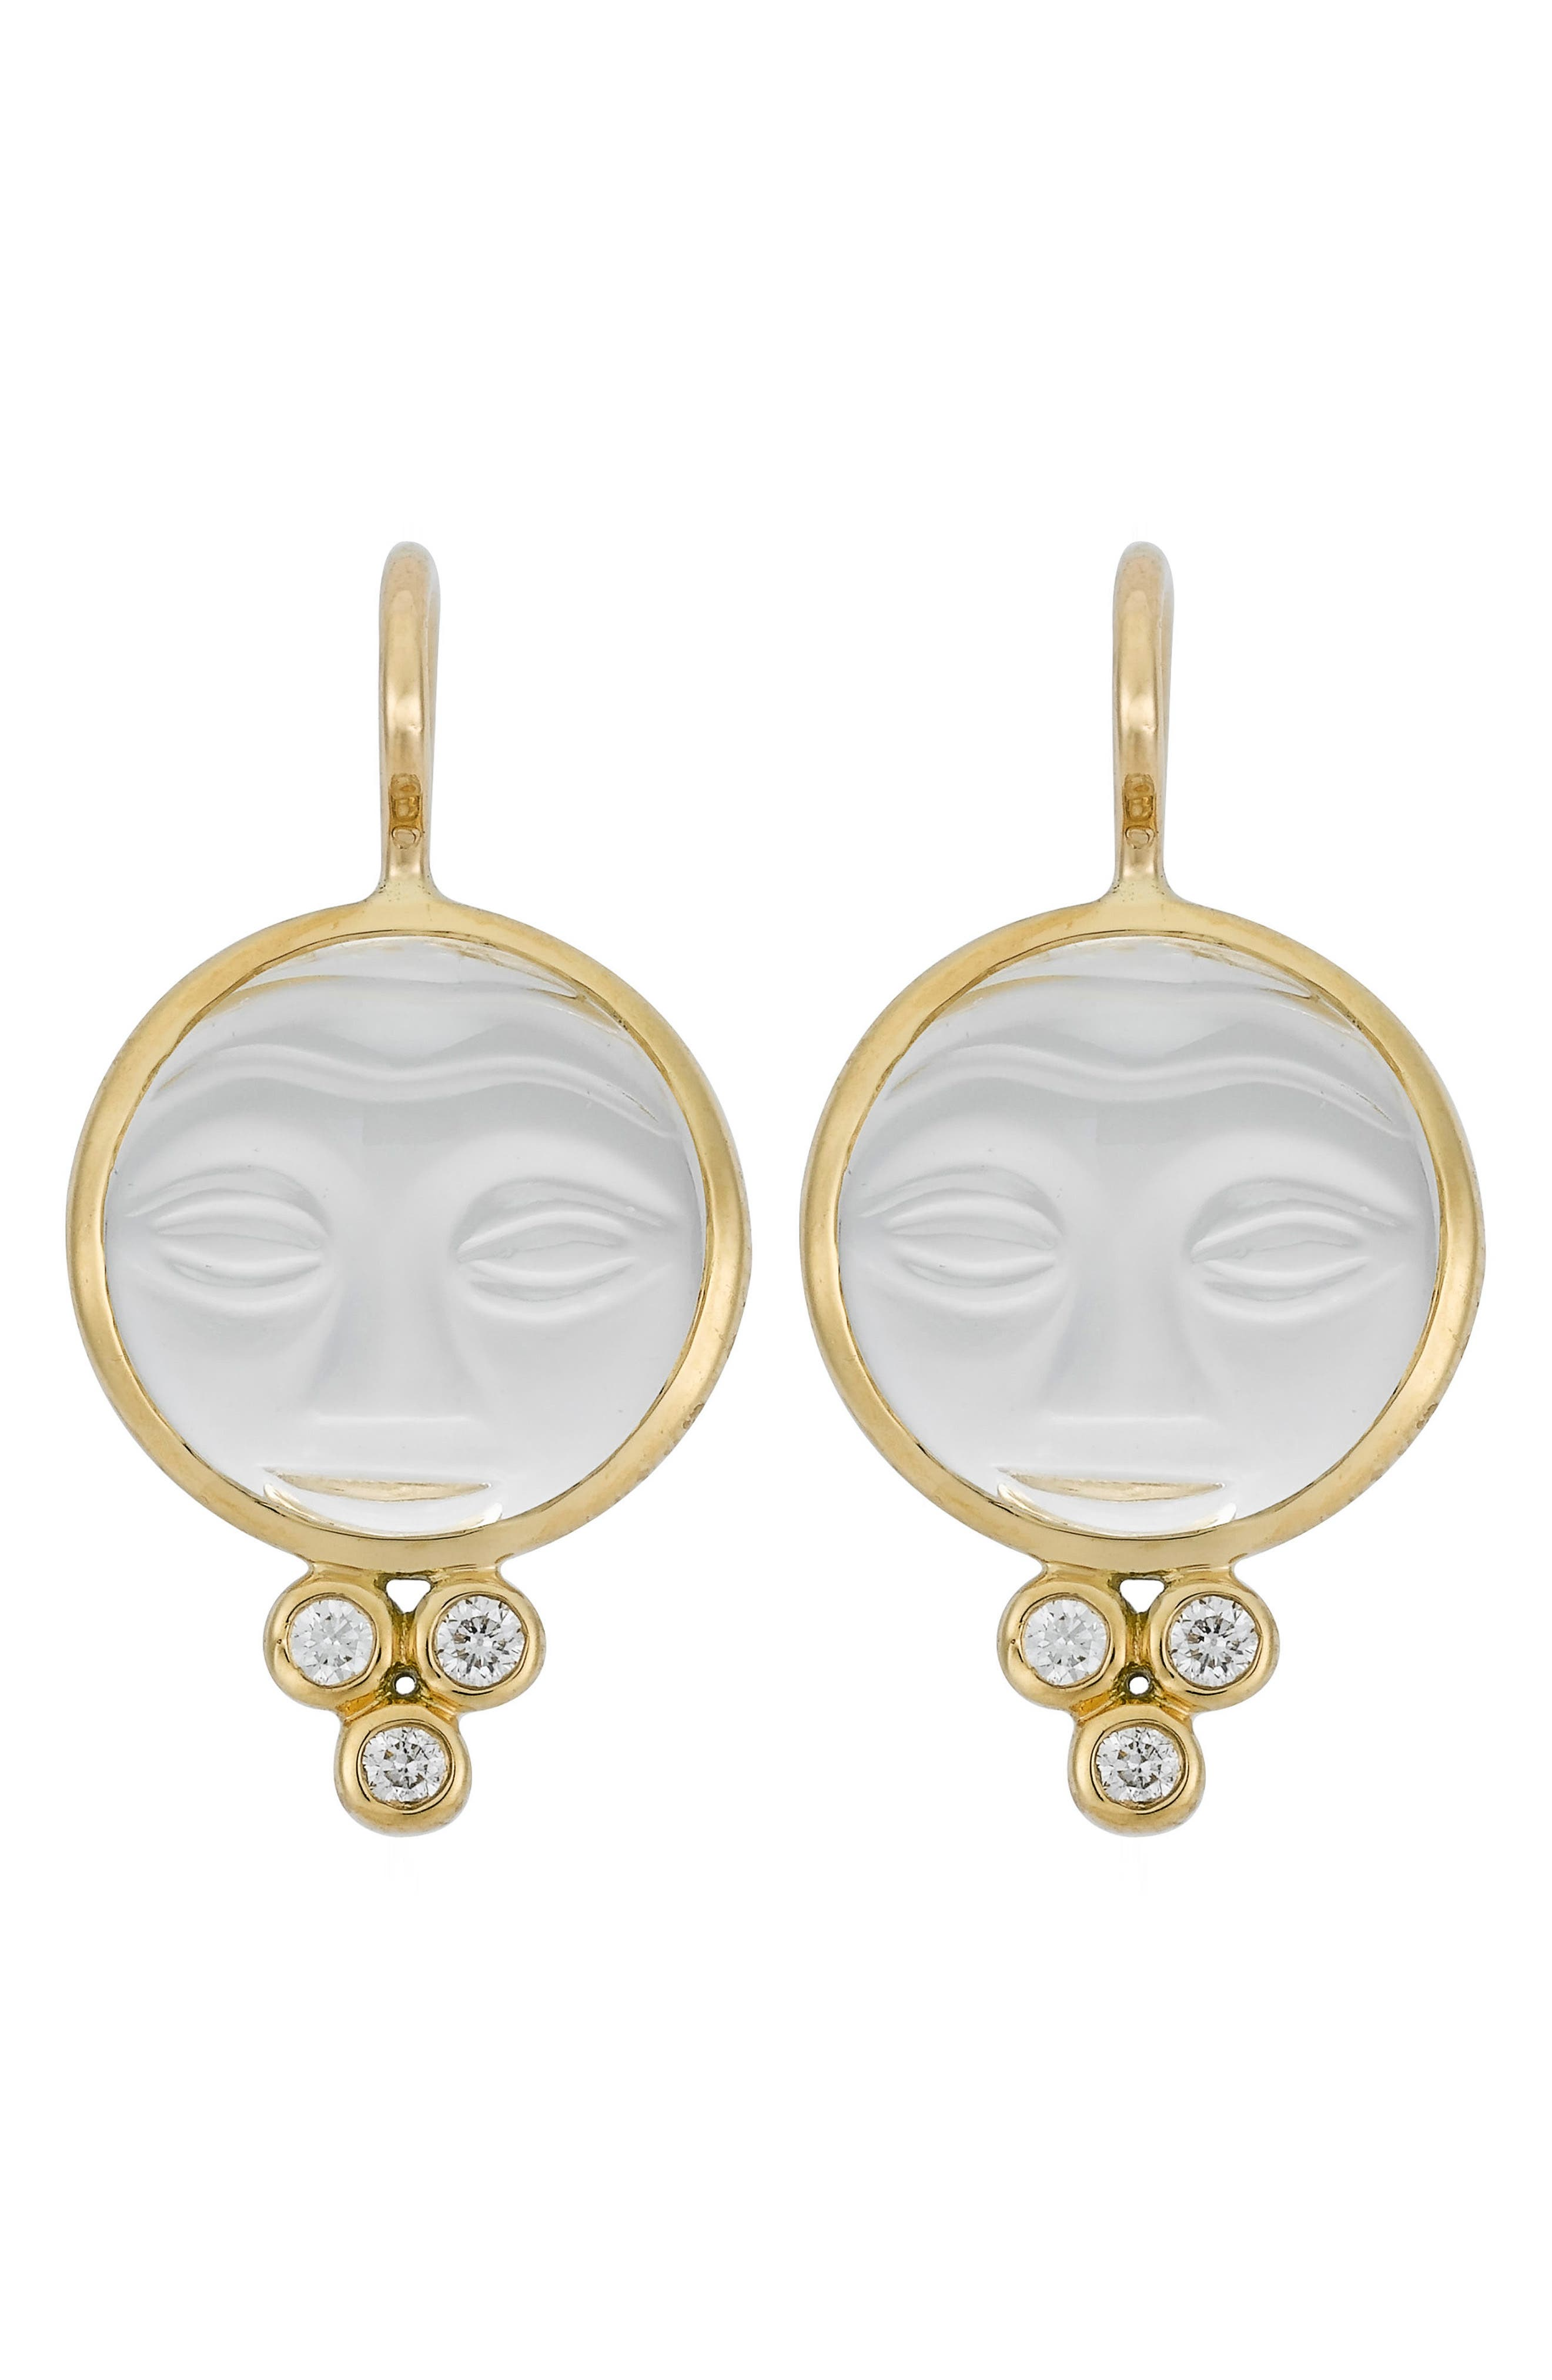 Temple St. Clair Moonface Diamond & Rock Crystal Earrings,                         Main,                         color, Yellow Gold/ Crystal